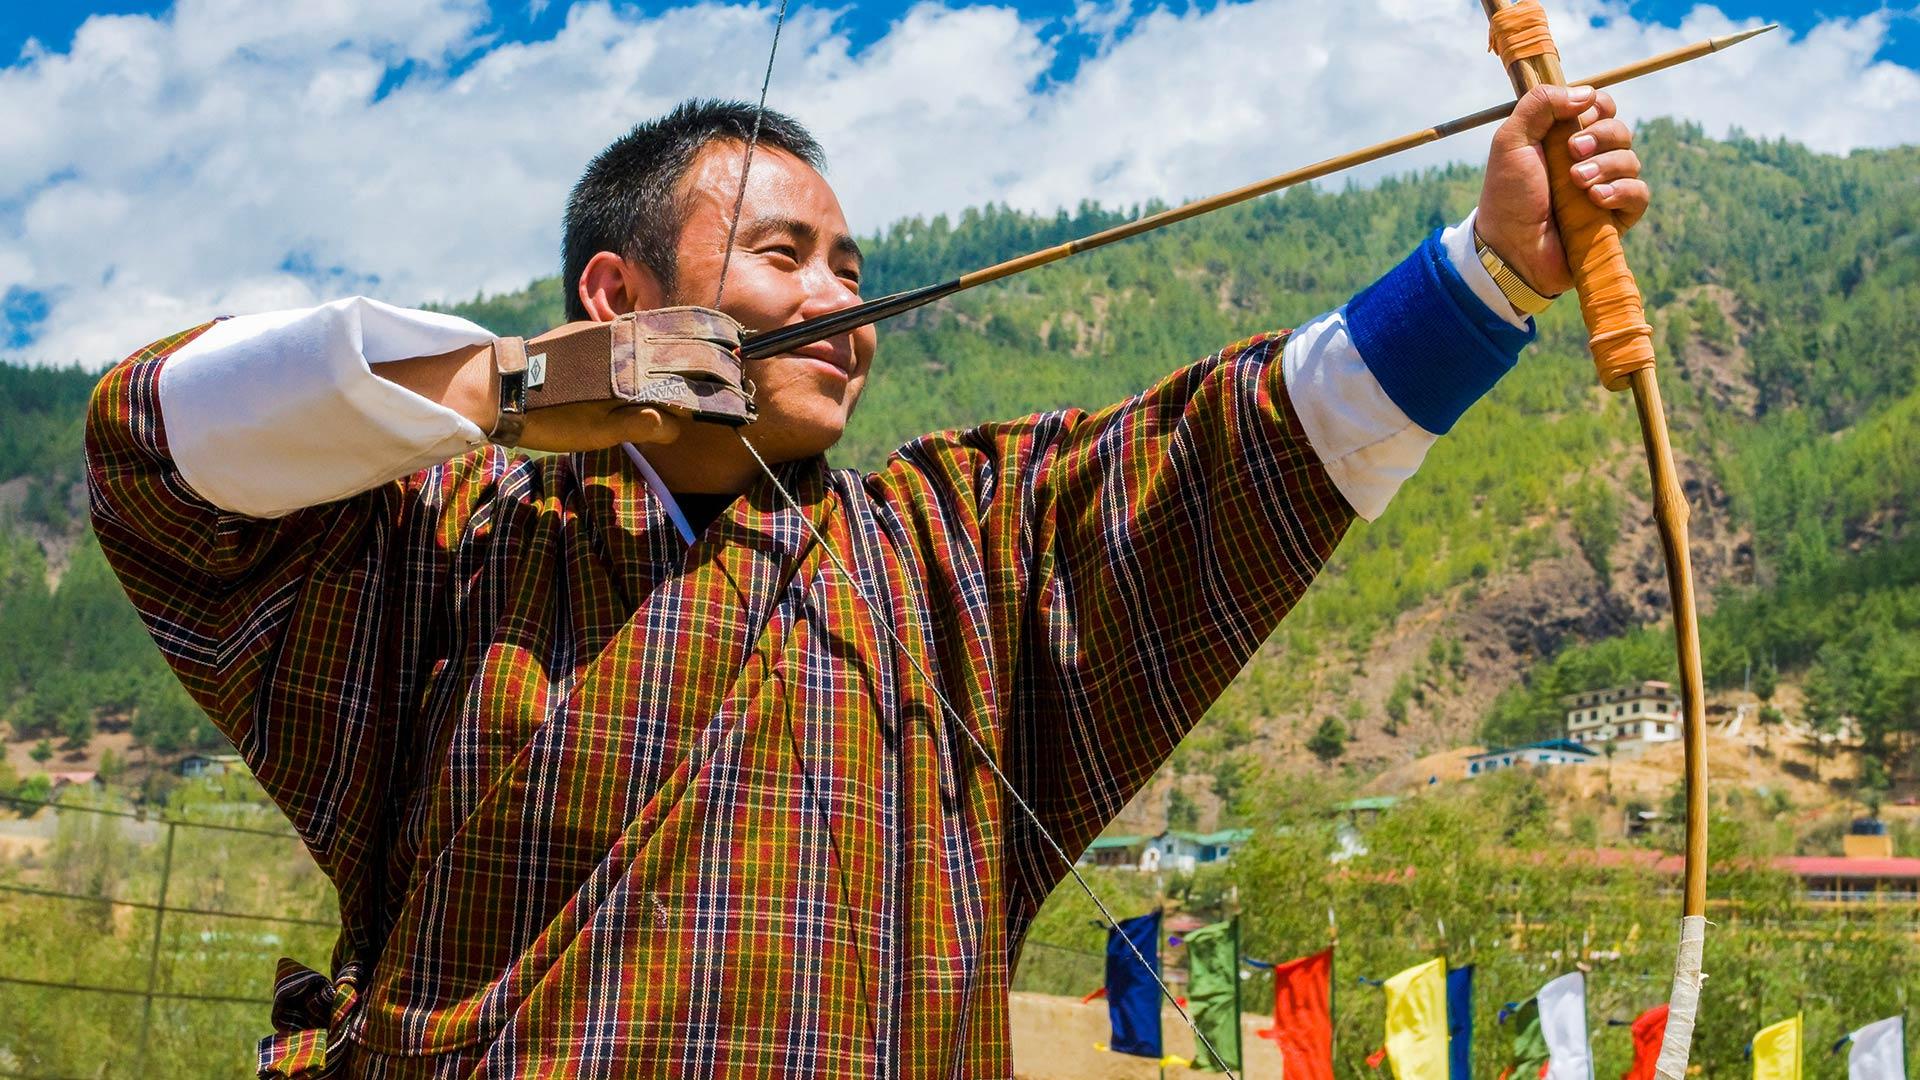 Bhutanese man in traditional dress practicing archery near Thimphu, Bhutan